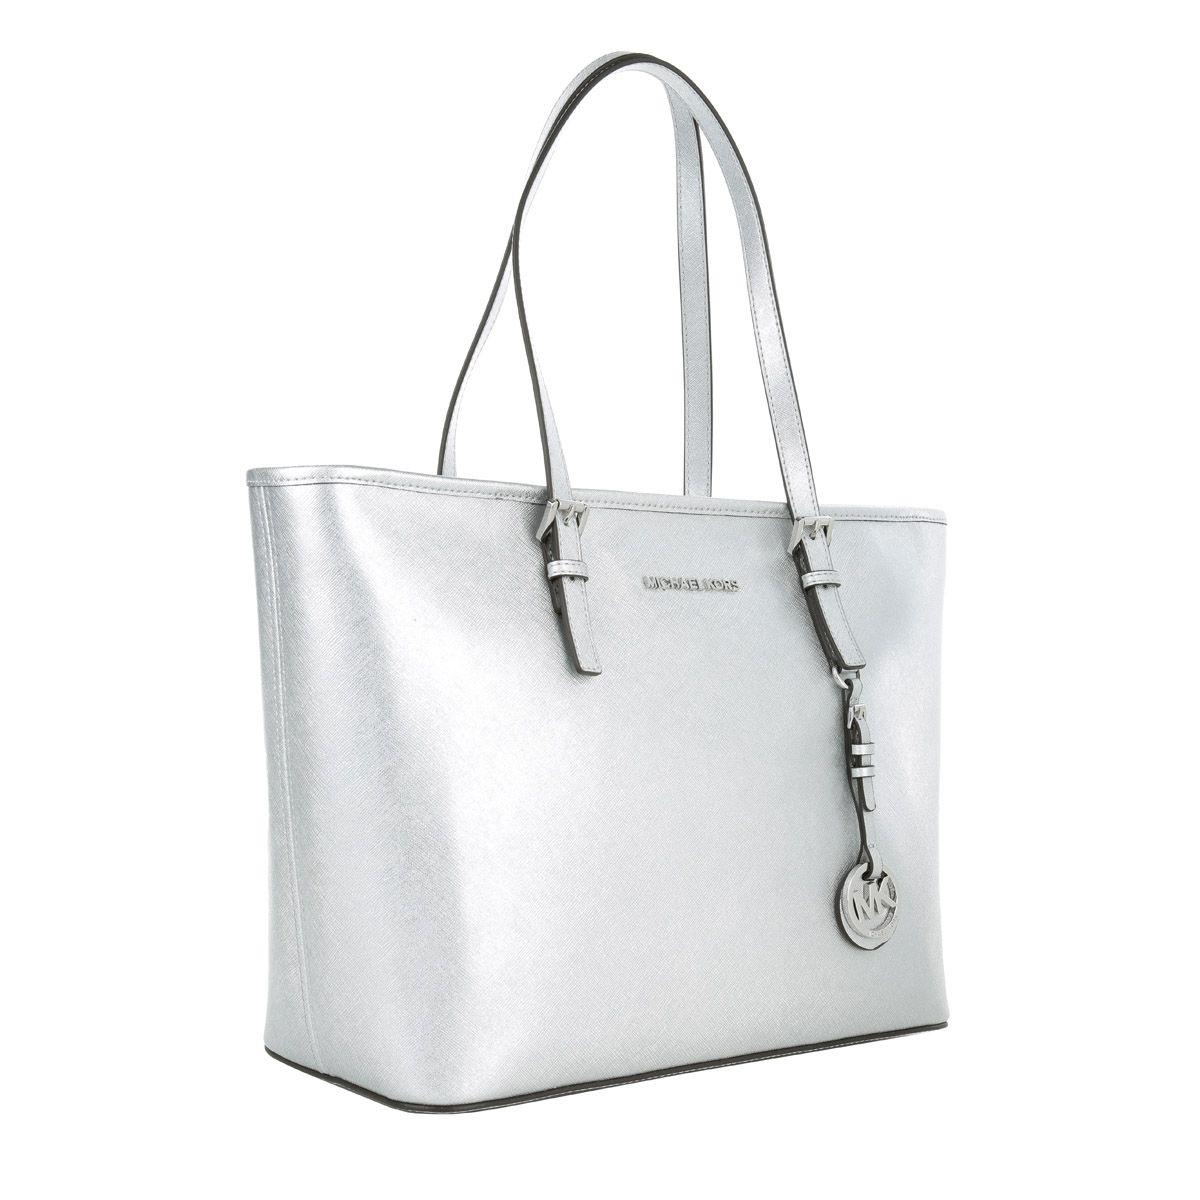 673318ab1f8dc MICHAEL Michael Kors Jet Set Travel TZ Tote Silver Shopper Designer Taschen  bei Fashionette